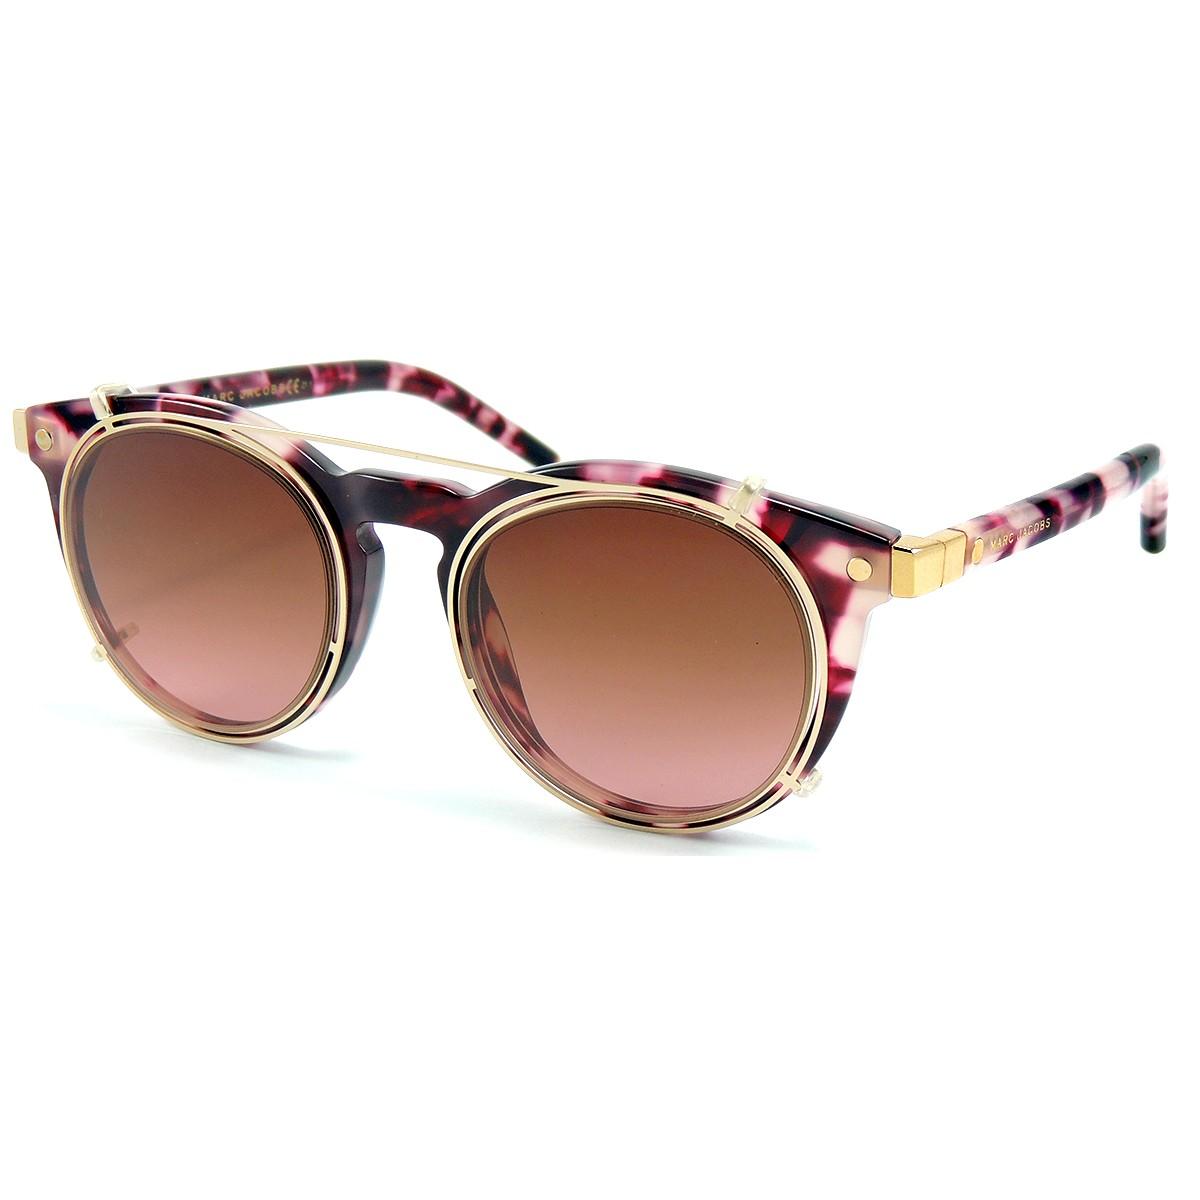 1d9c94fc2249d Compre Óculos de Sol Marc Jacobs em 10X   Tri-Jóia Shop